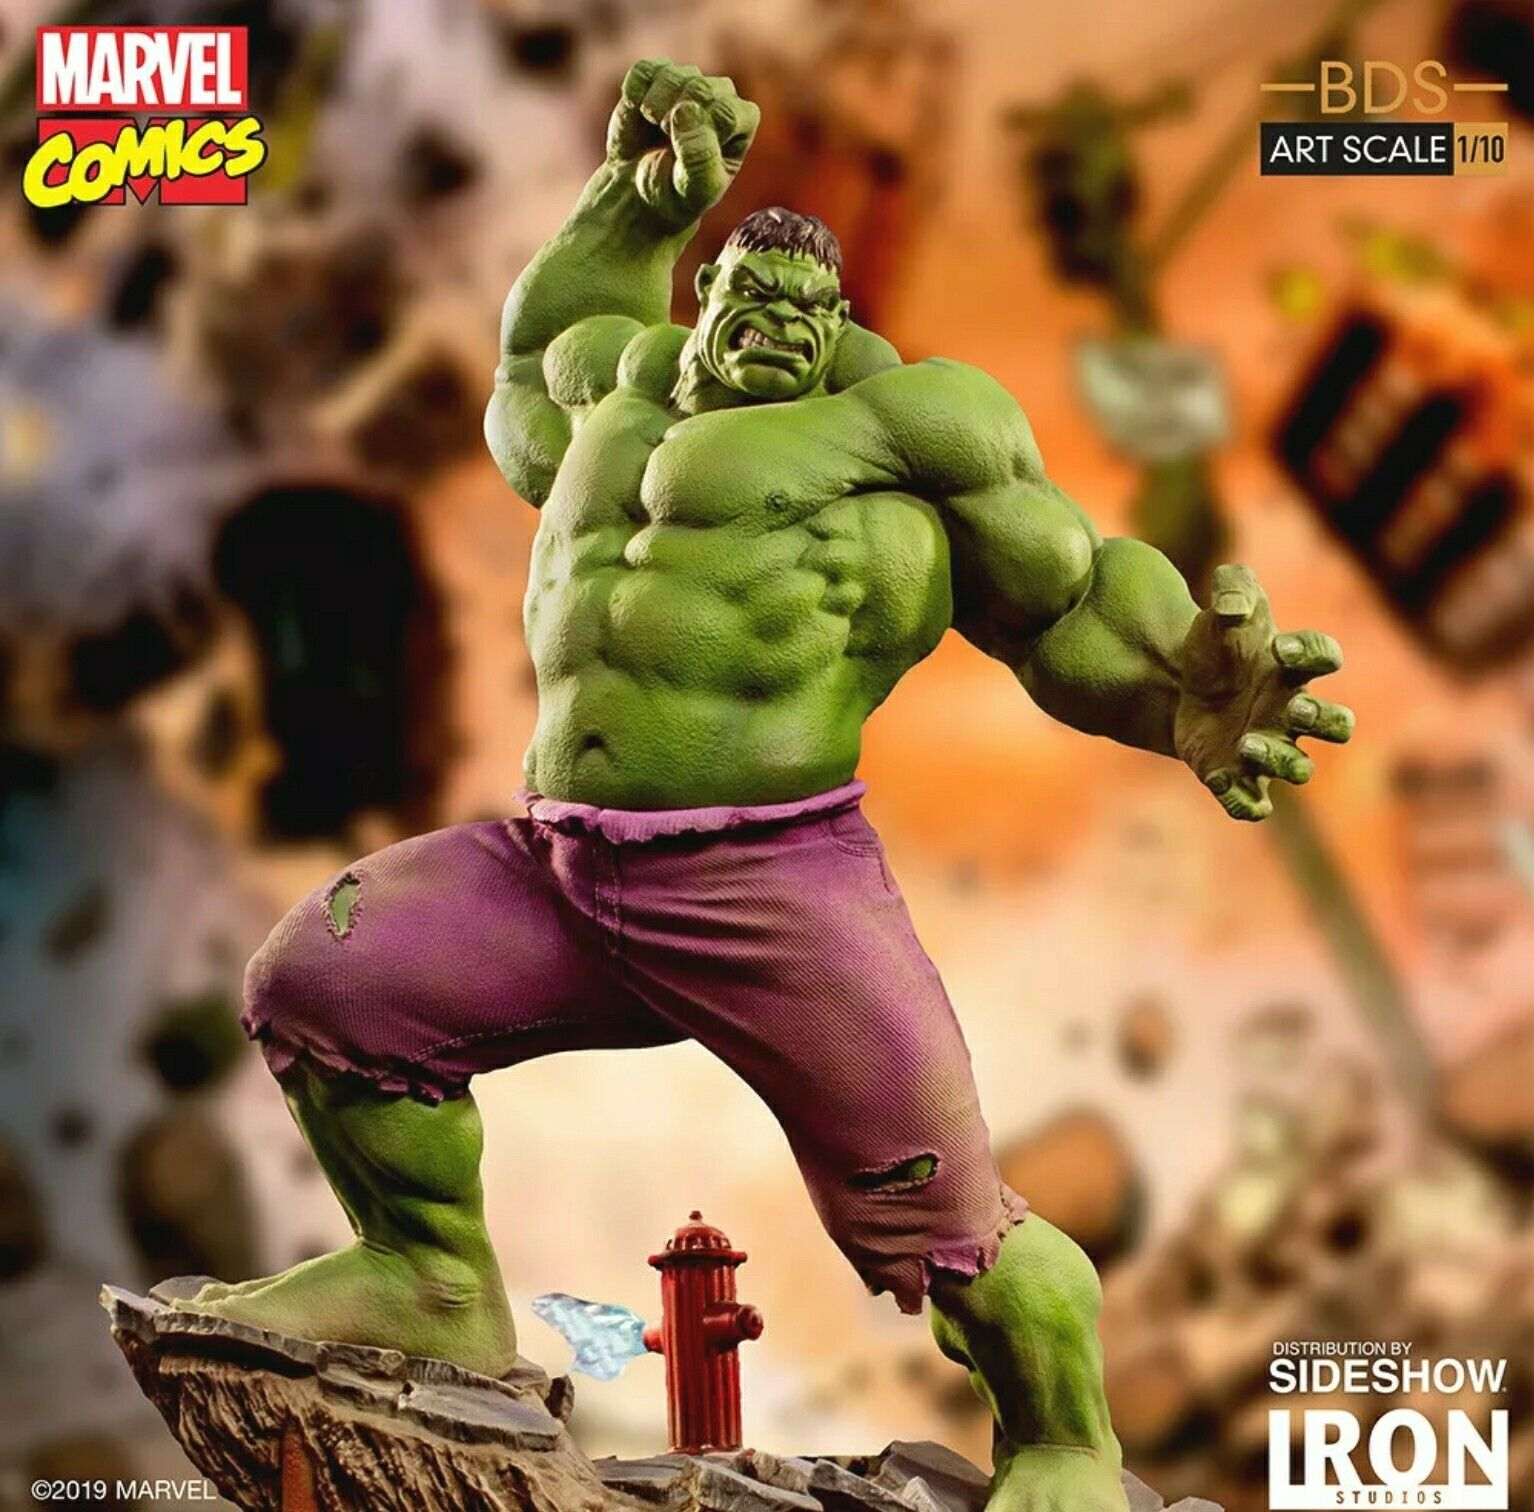 Iron Studios Marvel Comics INCREDIBLE HULK 1/10th BDS Art Scale Statue on eBay thumbnail